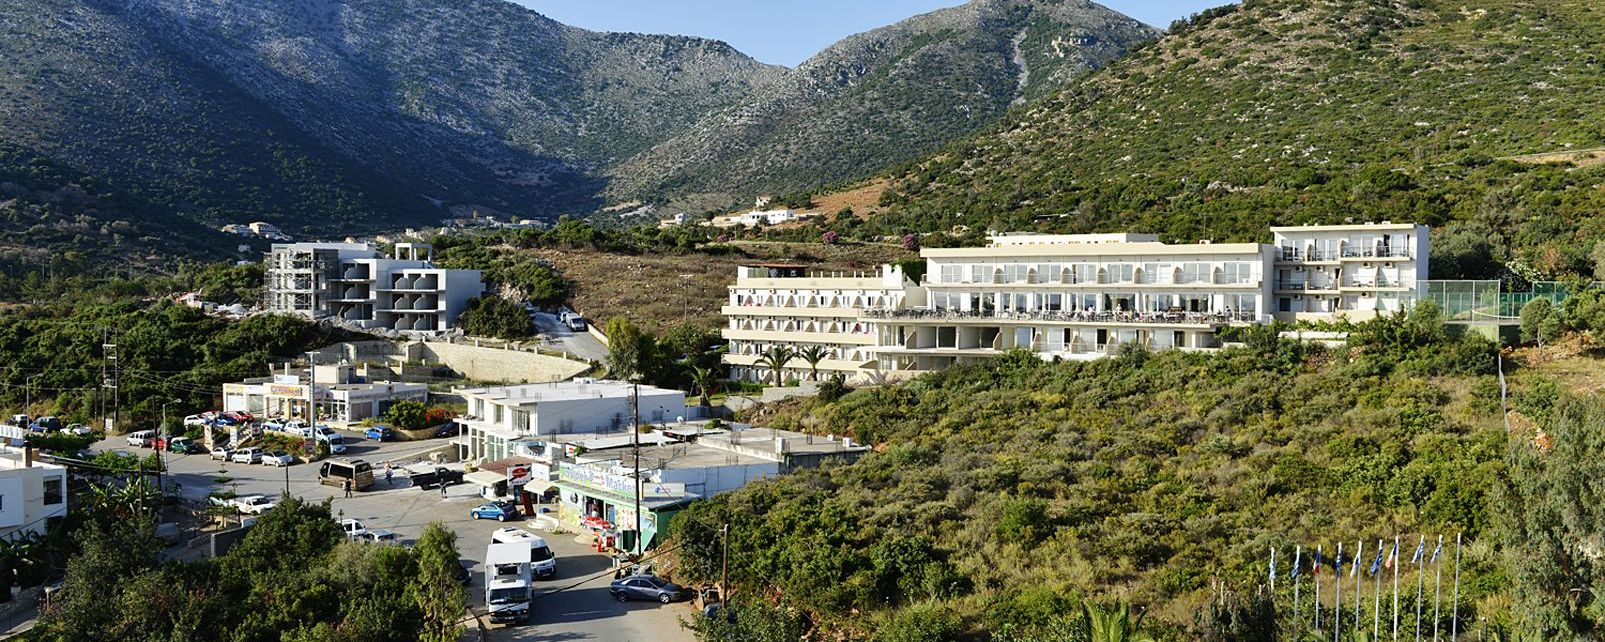 Club Héliades Attali Village